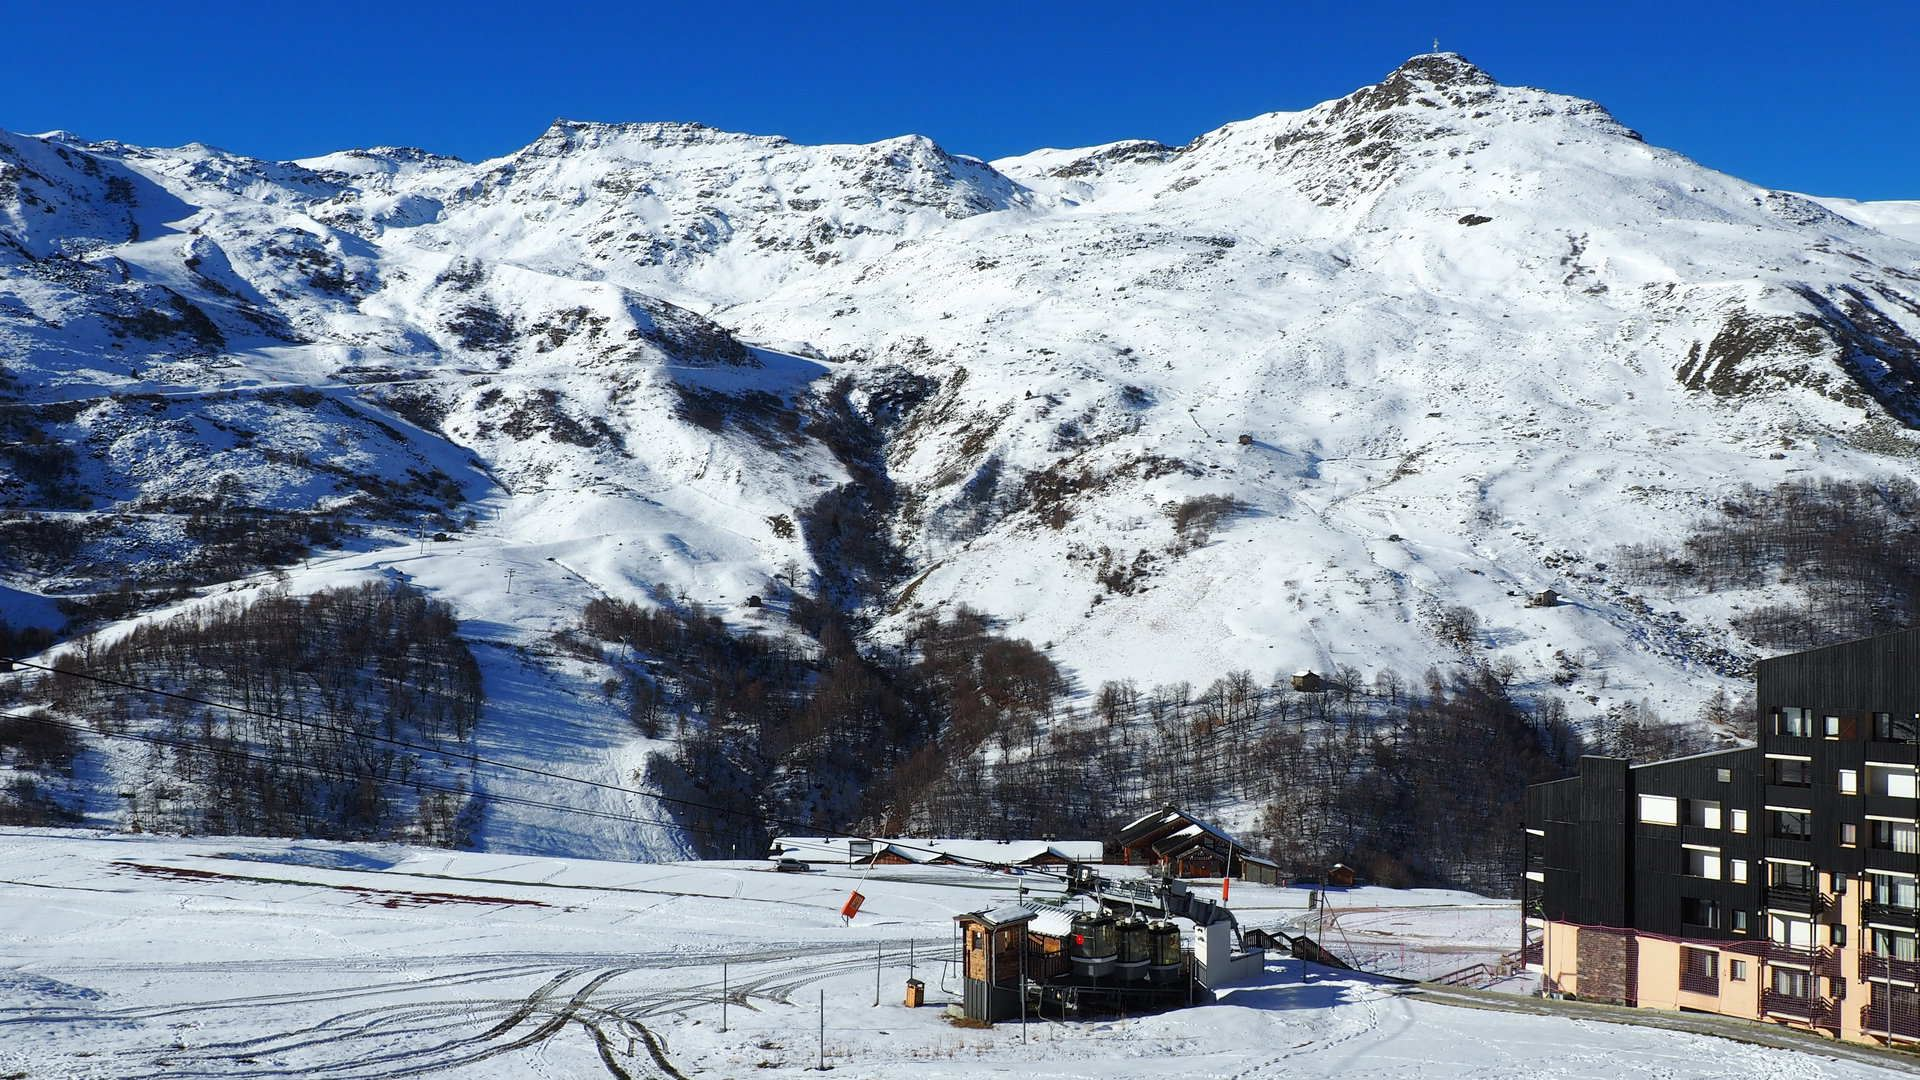 3 Pers Studio ski-in ski-out / CARON 303